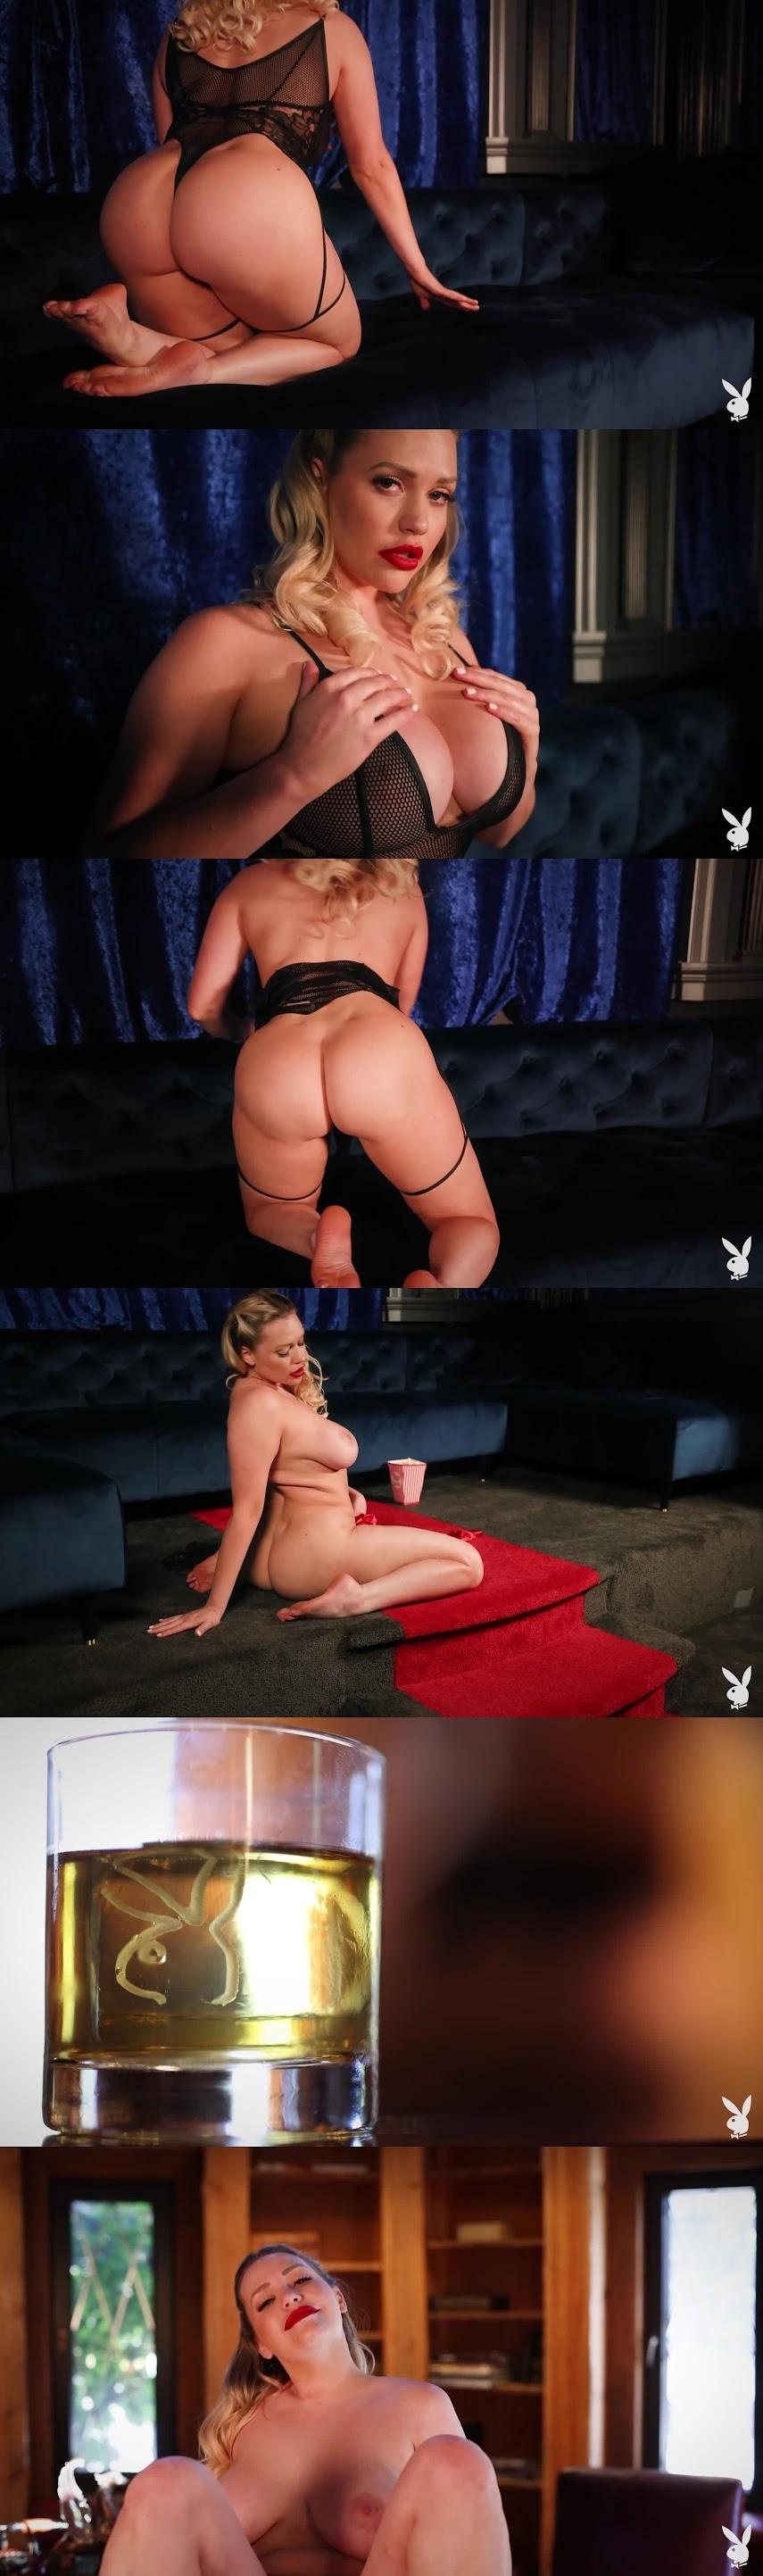 [Playboy Plus] Mia Malkova in Off the Clock sexy girls image jav